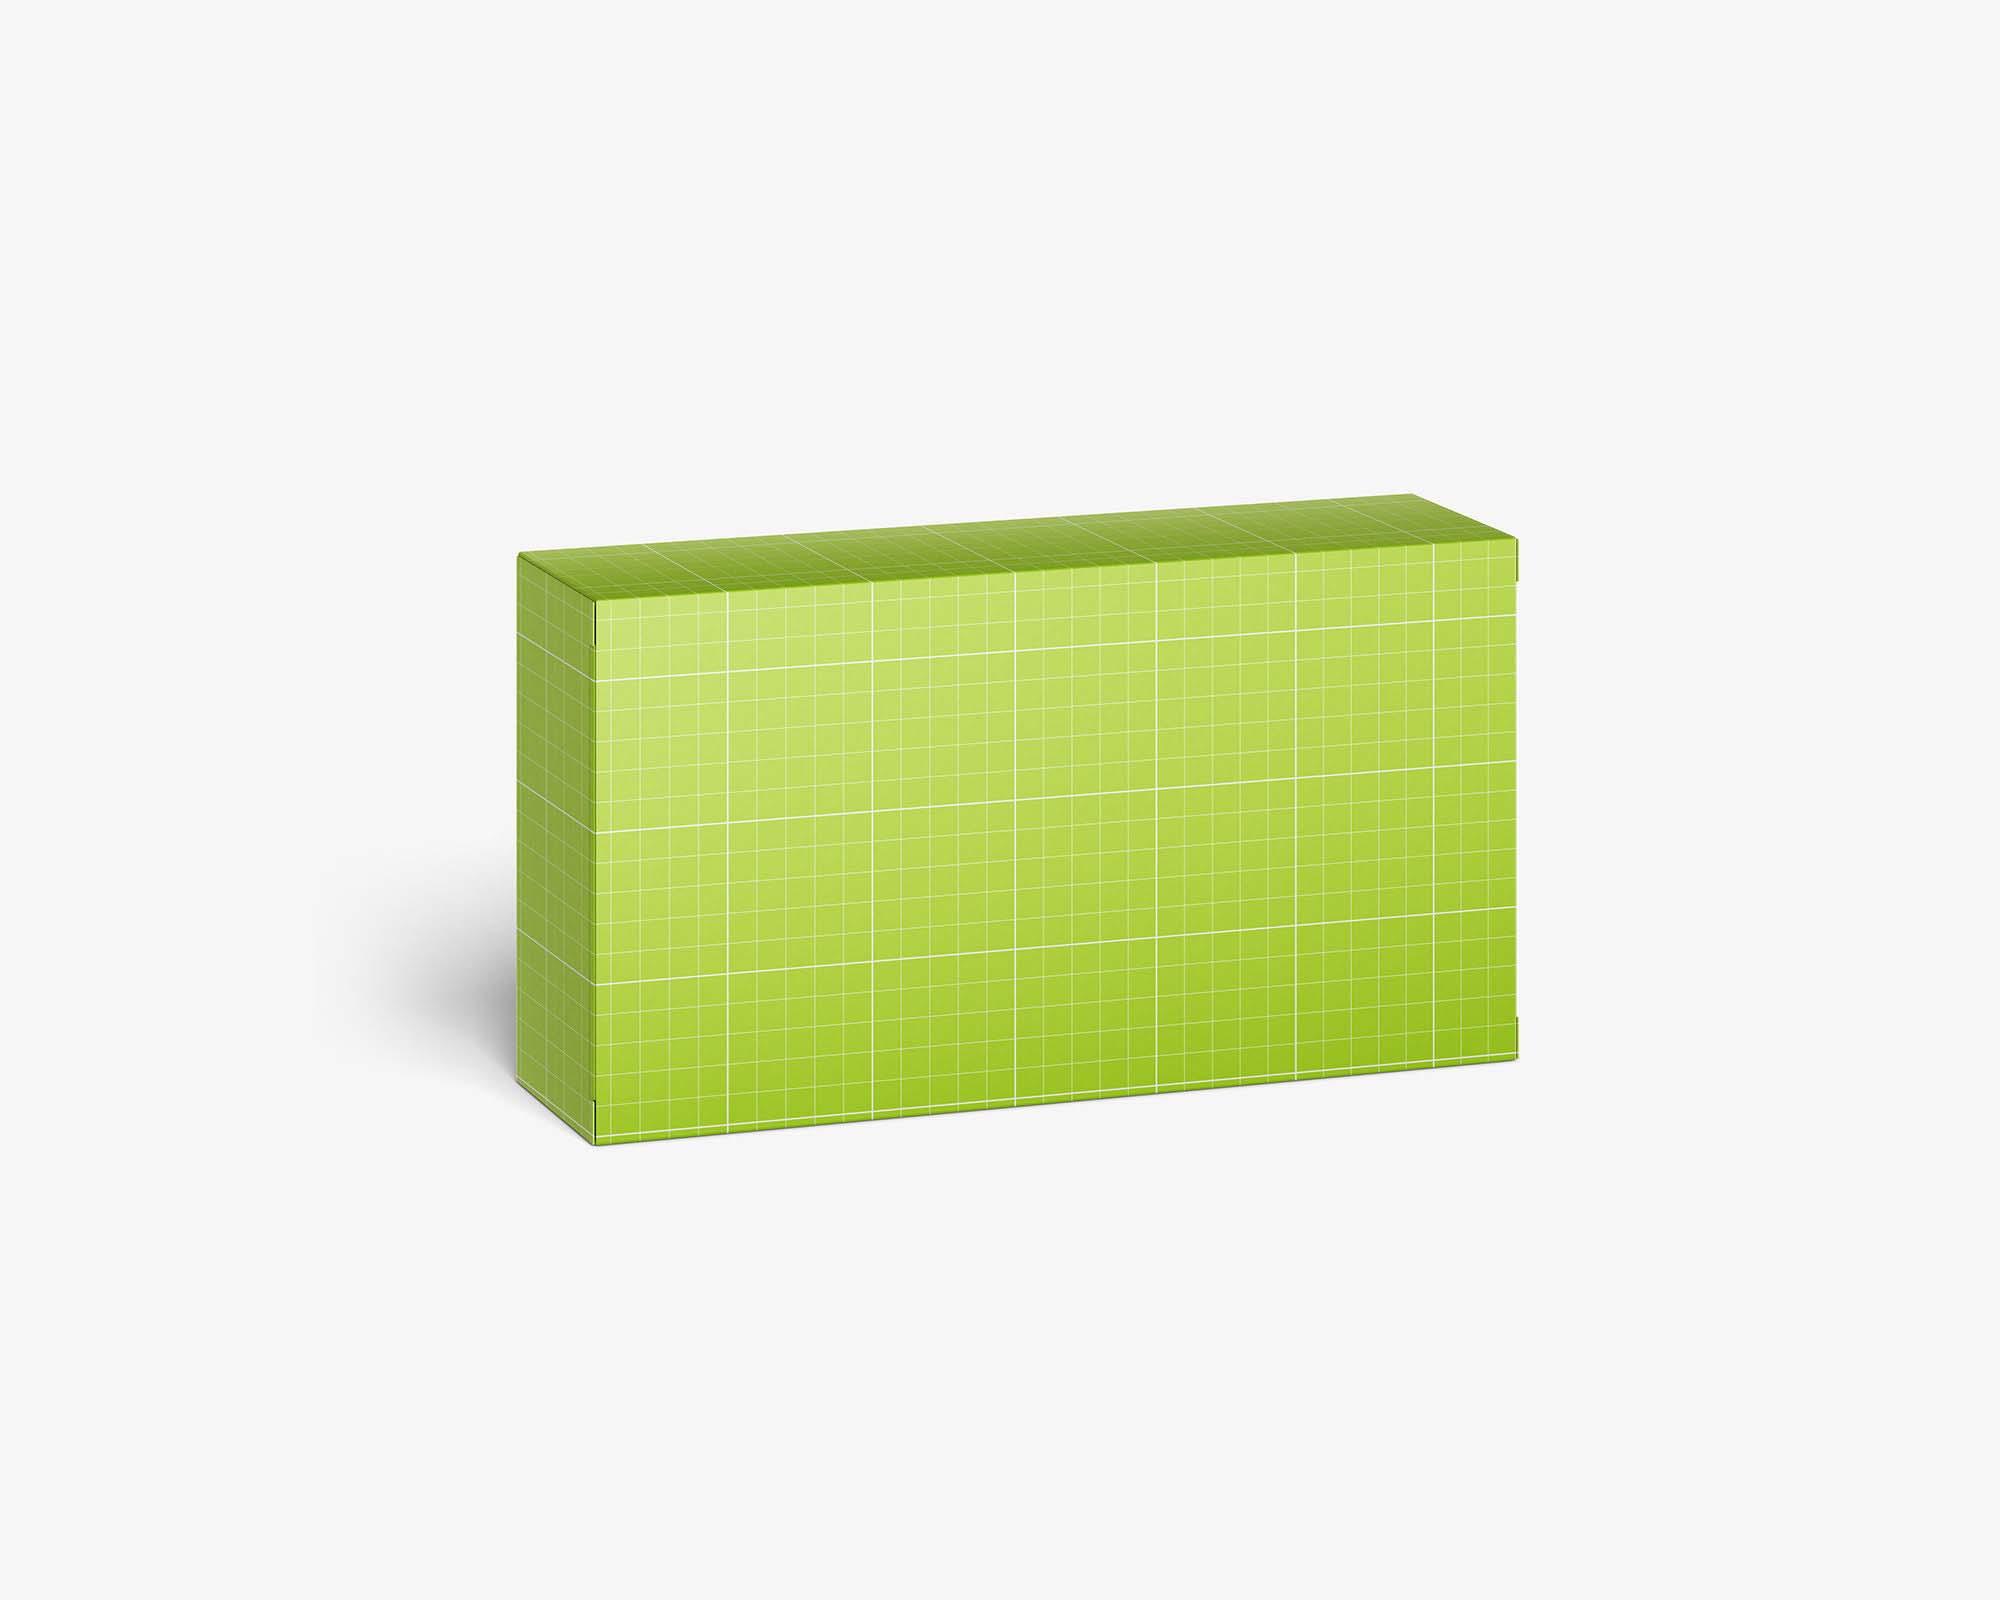 Cardboard Box Mockup 2